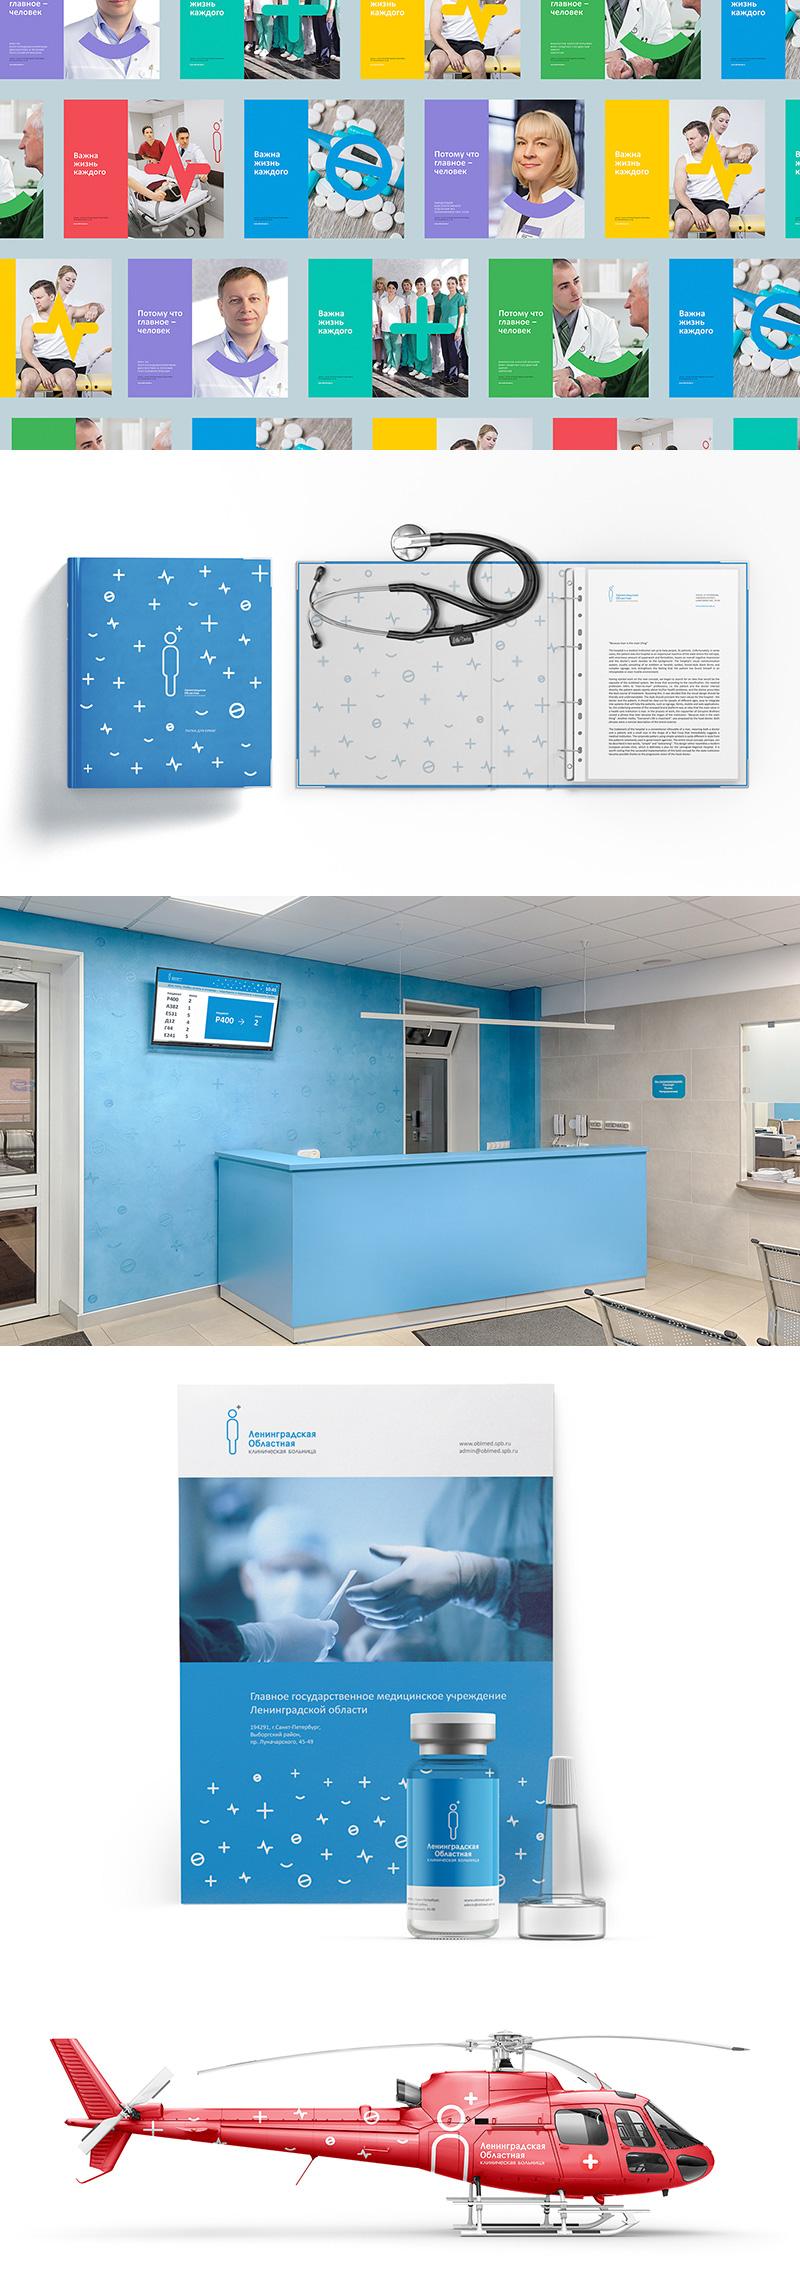 LENINGRAD REGIONAL CLINICAL HOSPITAL by Goryanin Brothers